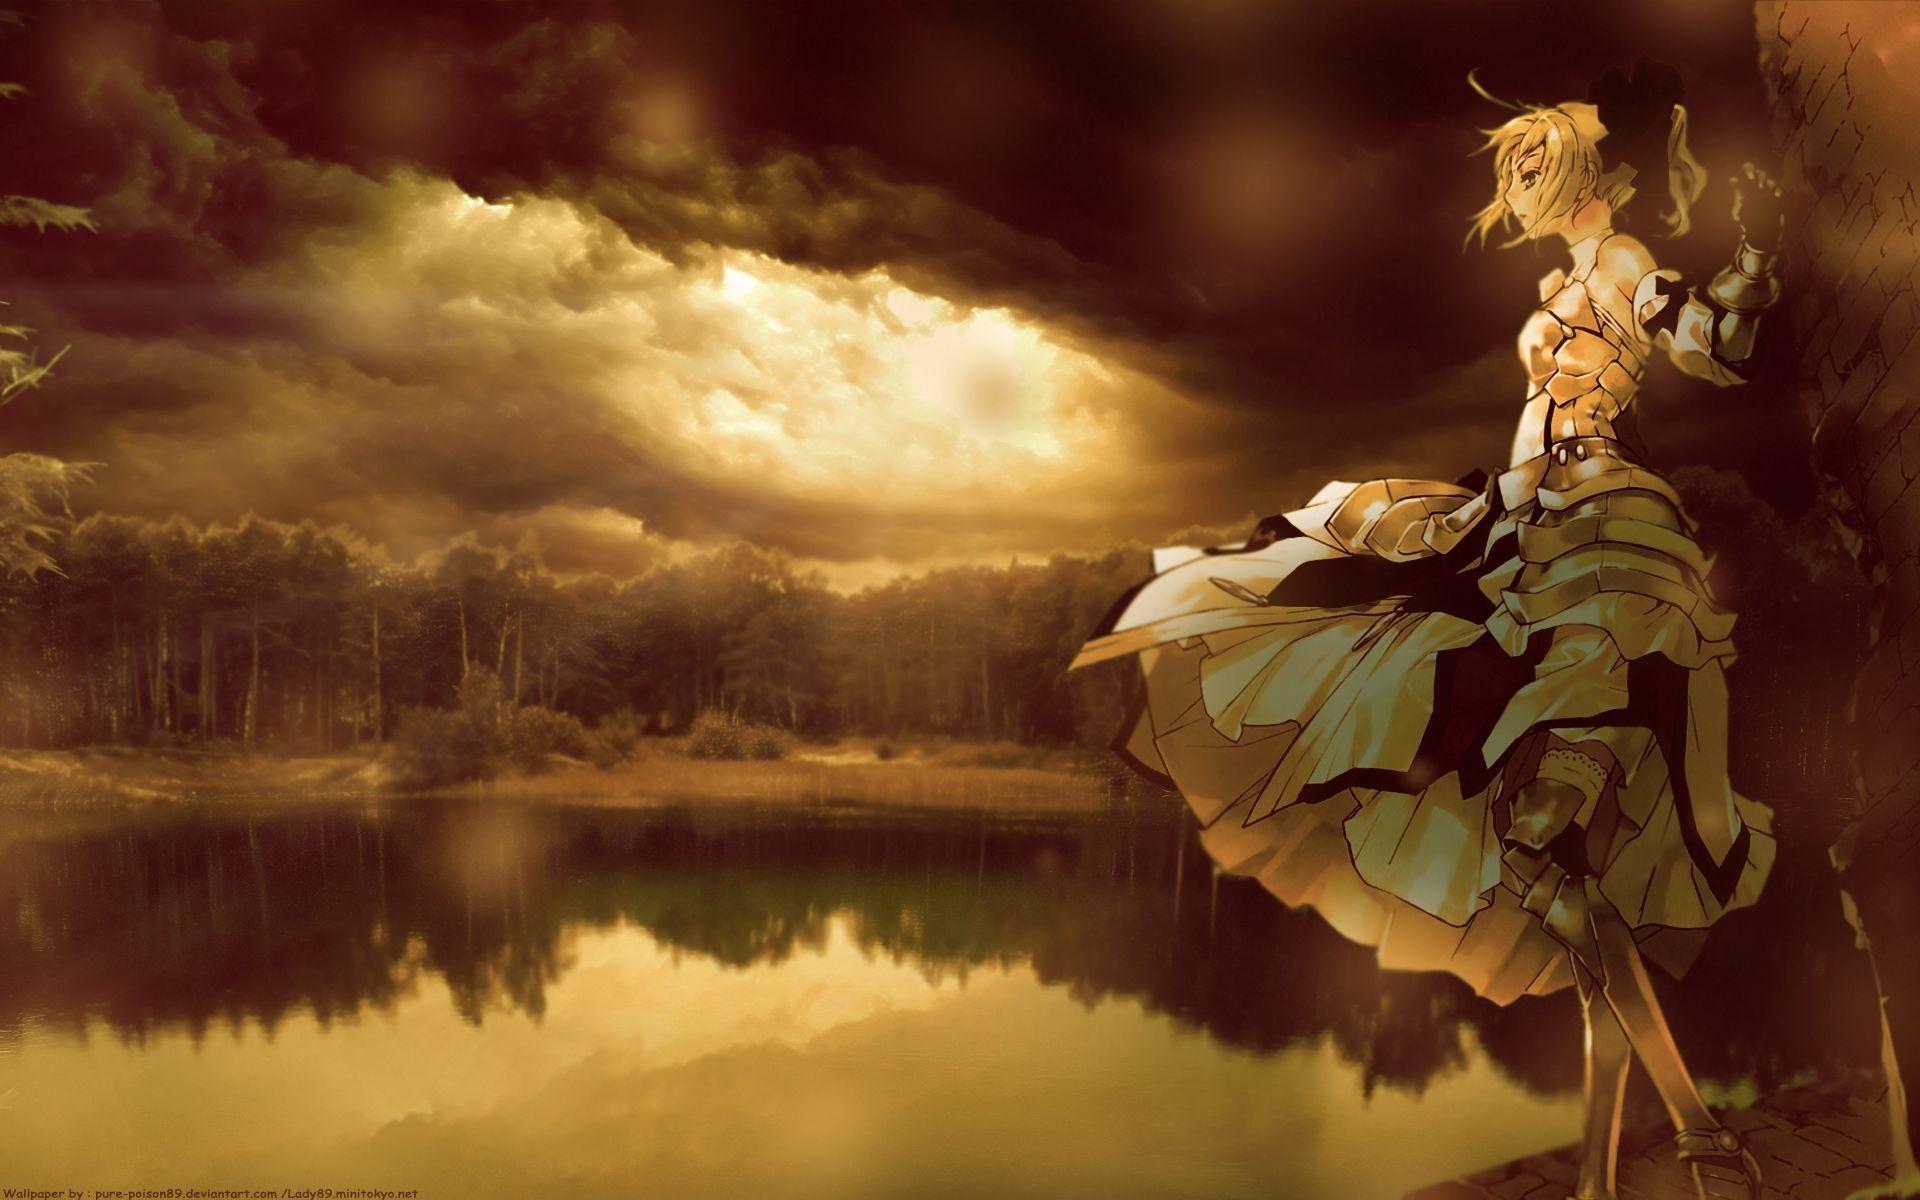 Minitokyo_Fate-Stay_Night_Wallpapers_438845.jpg